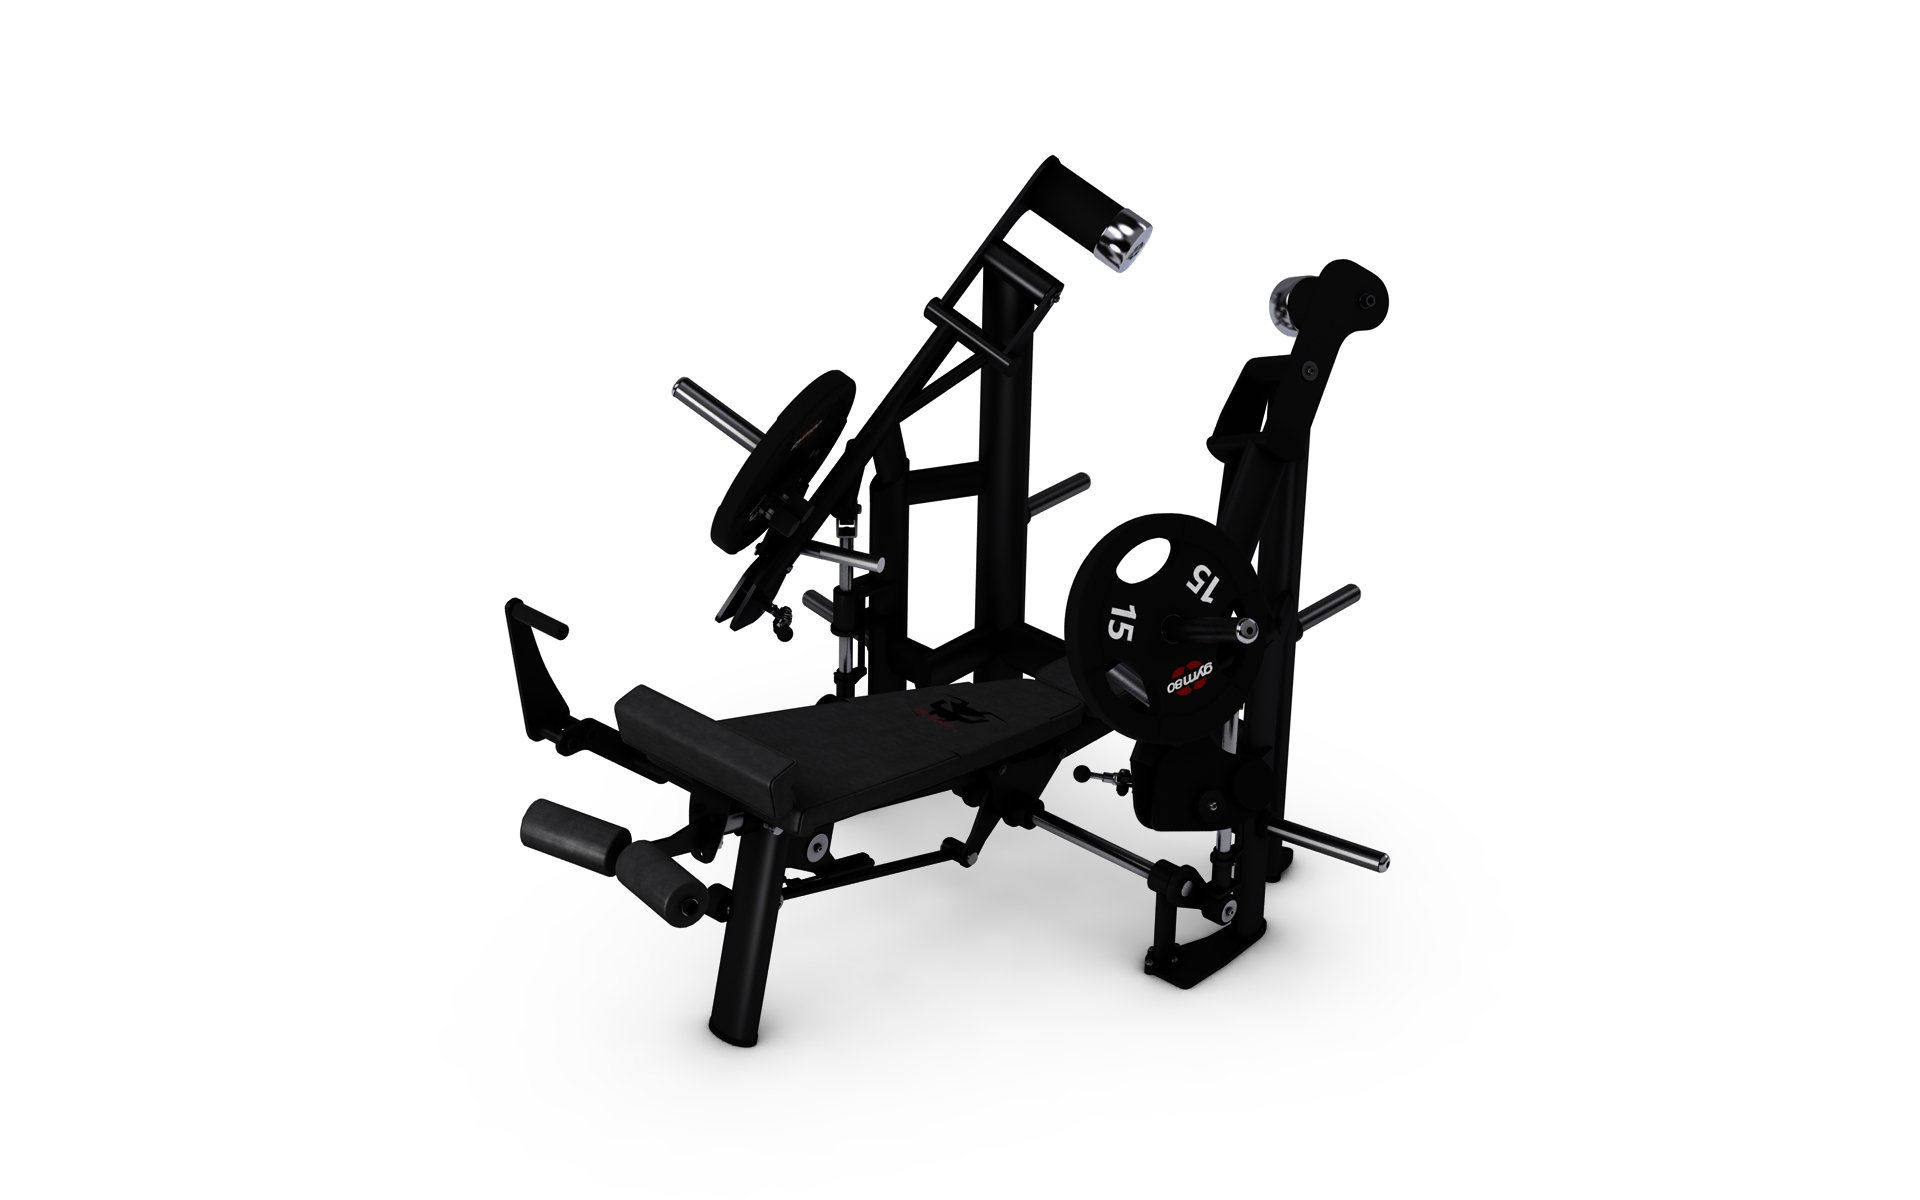 gym80 Pure Kraft Strong Decline Chest Press Dual